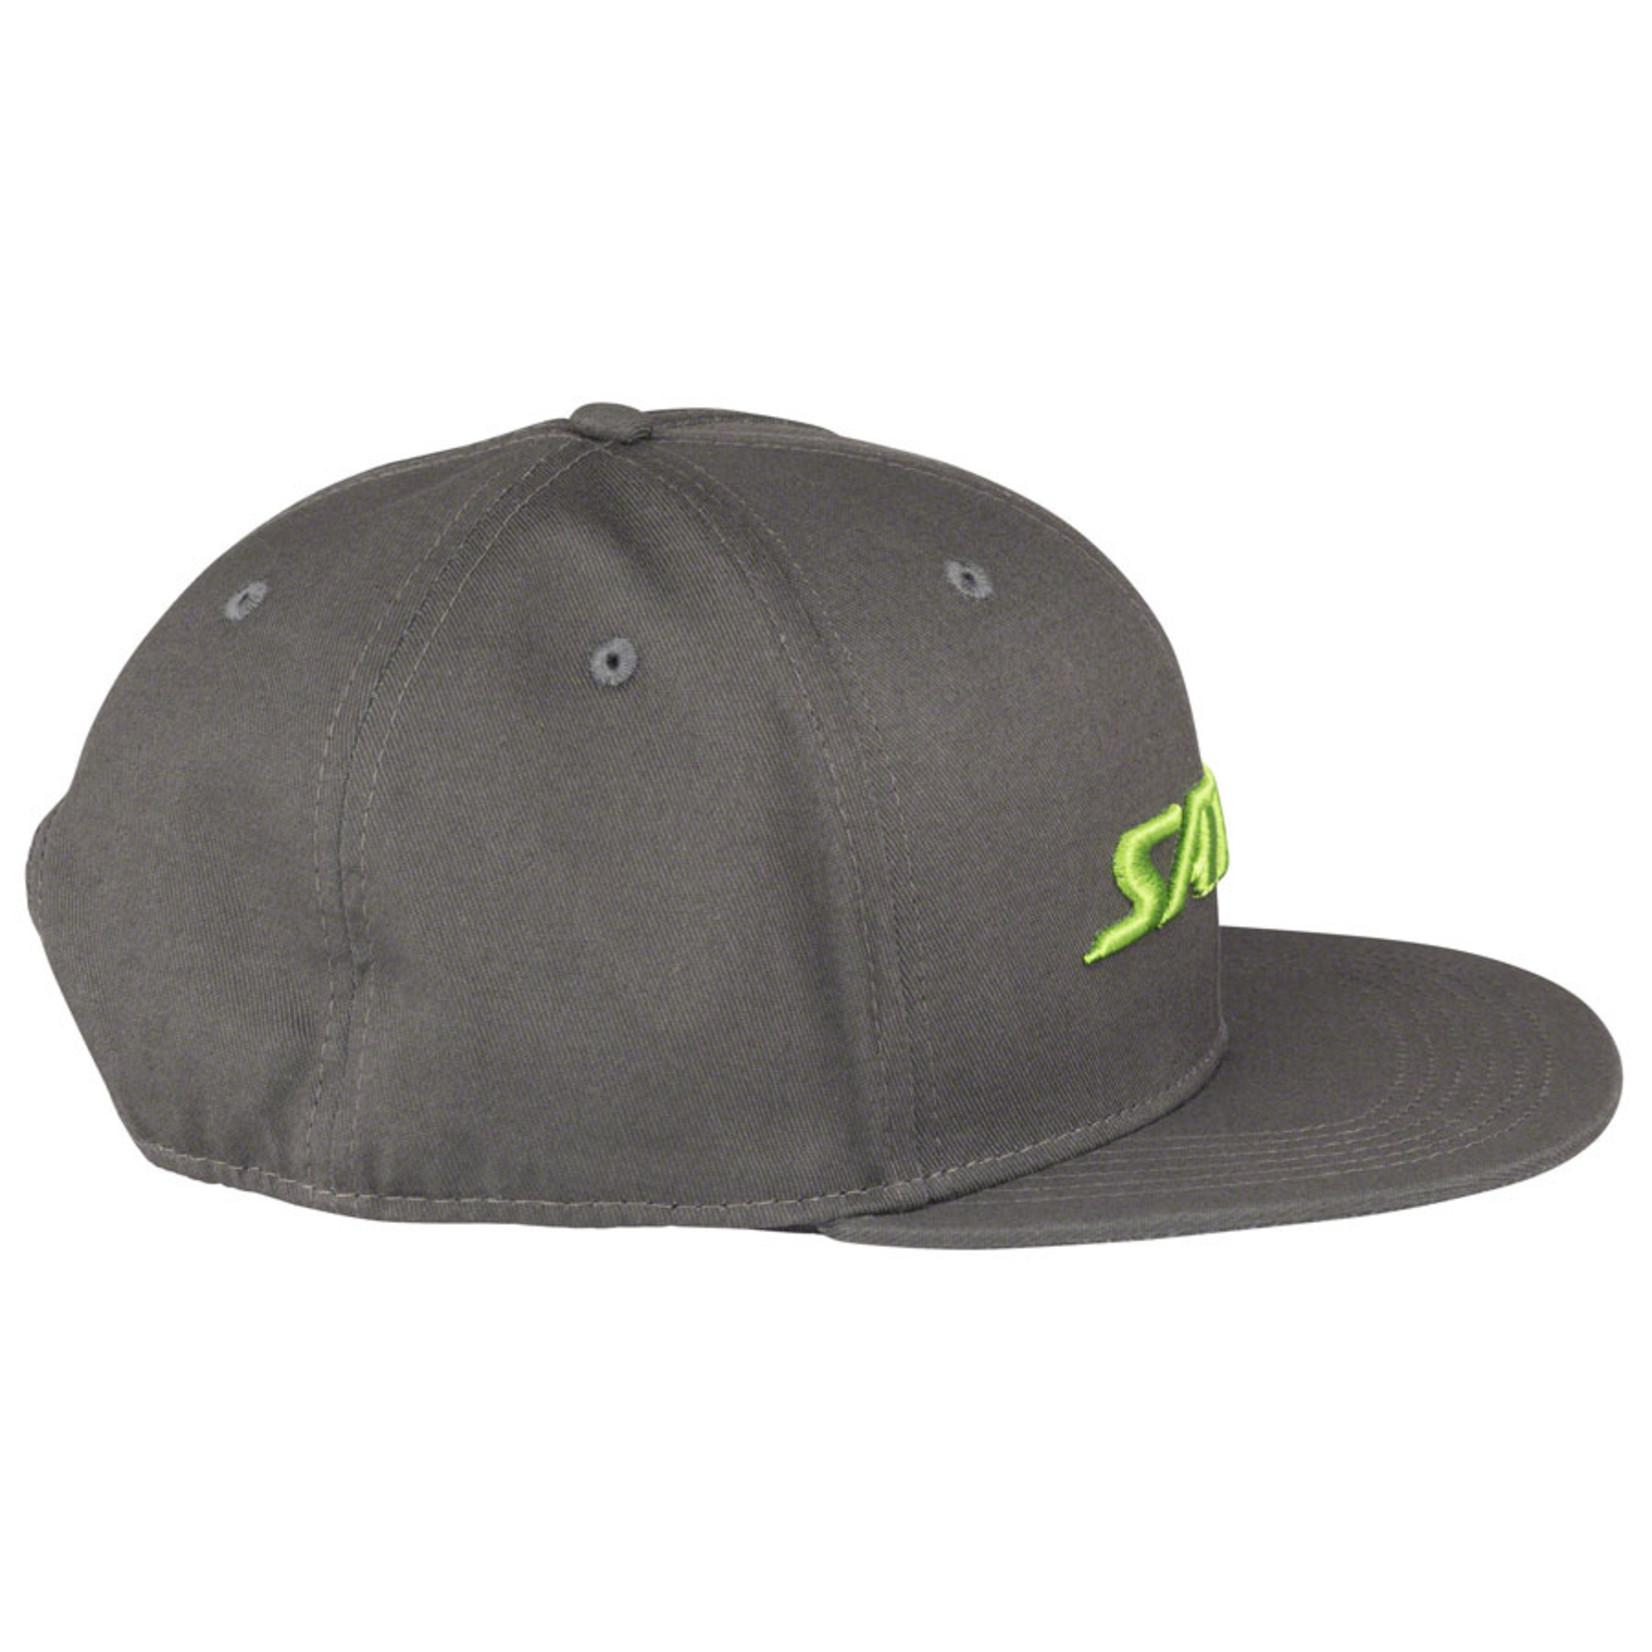 Salsa Salsa Always Rustlin' Snapback Hat - Gray, One Size